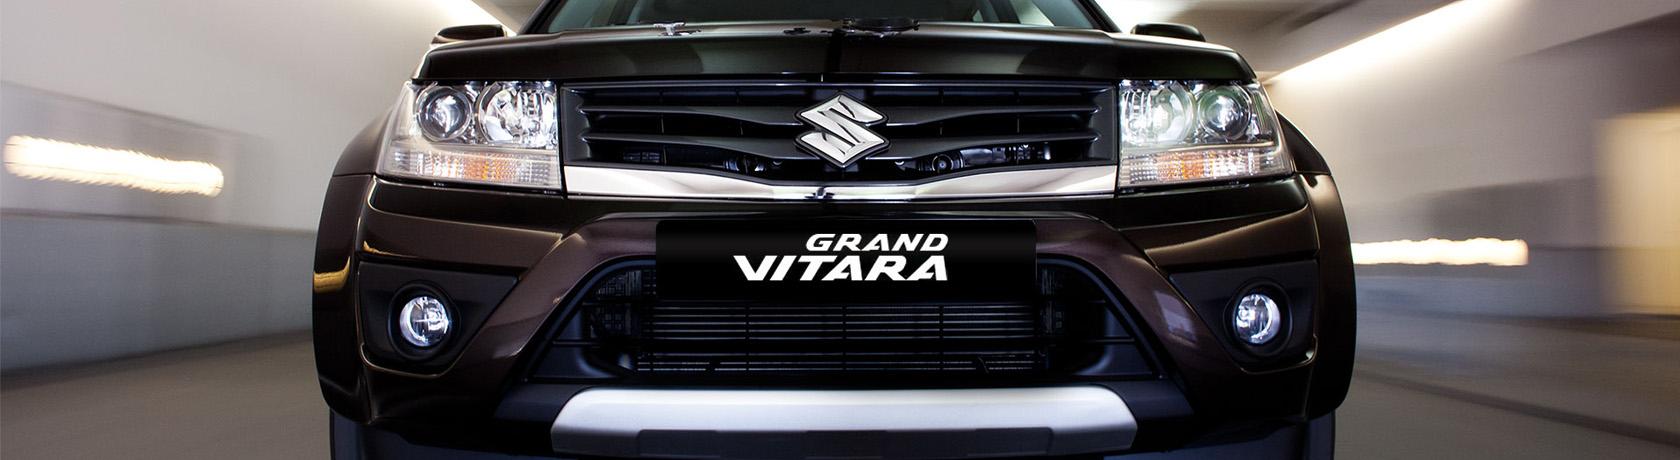 New Grand Vitara for sale in Brisbane - Q Suzuki